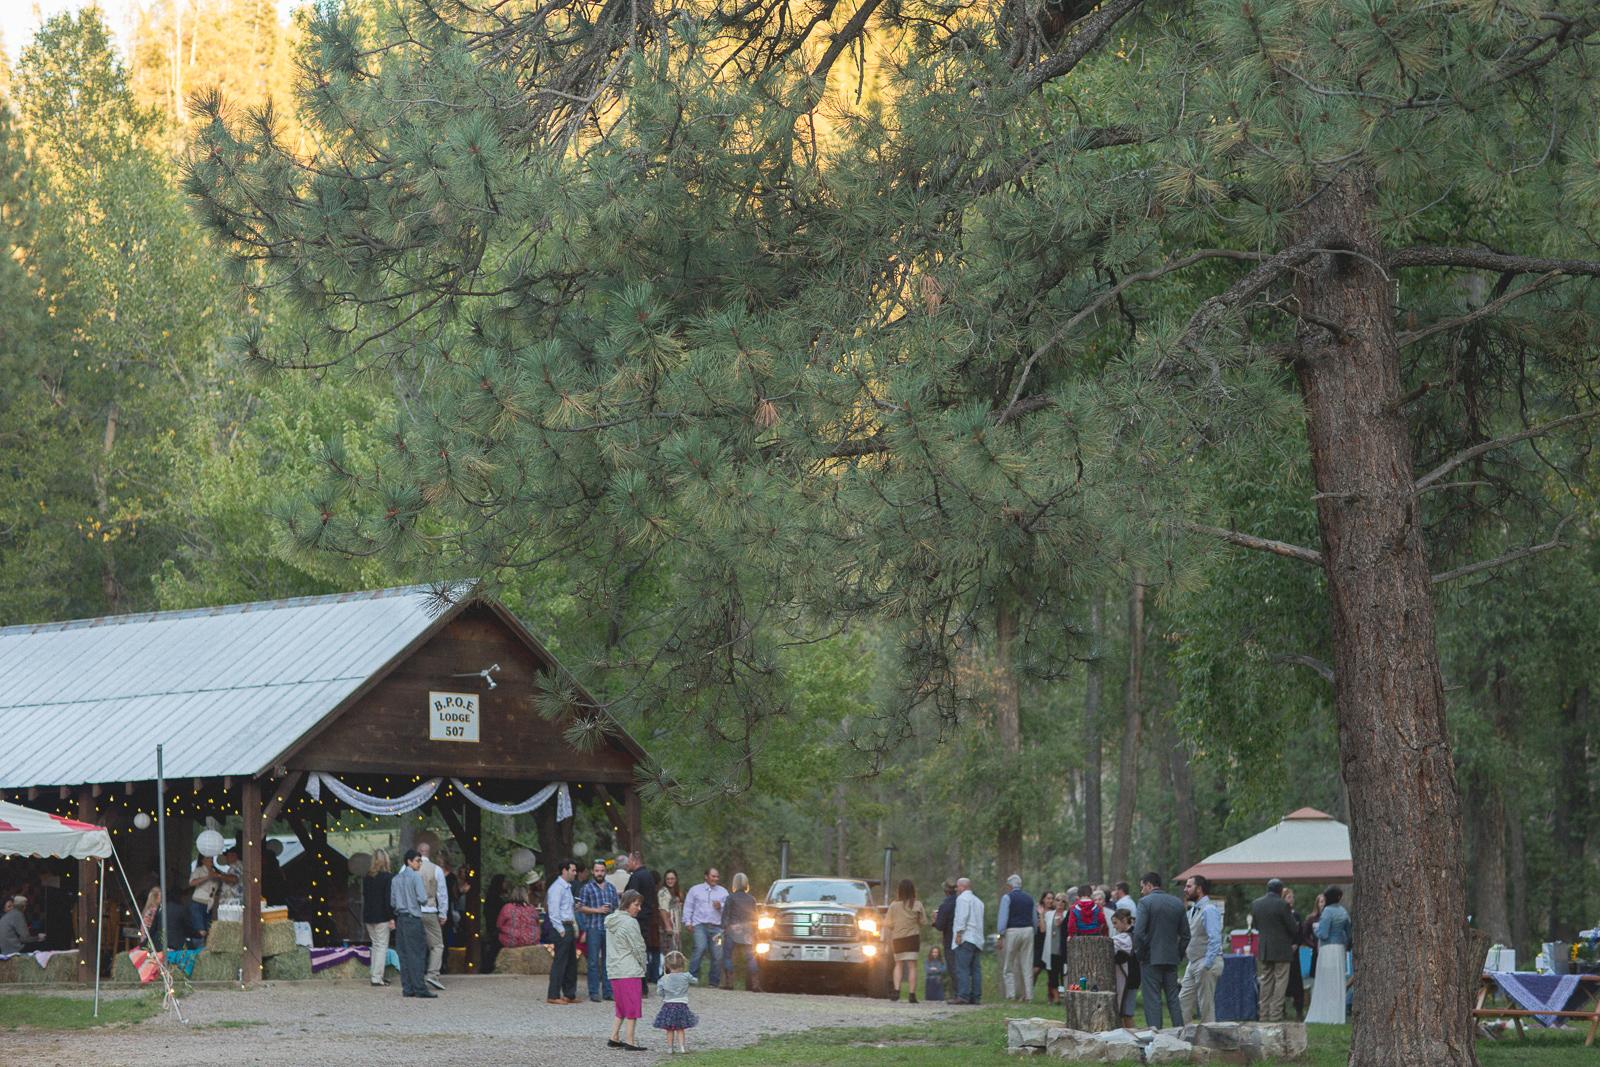 157-wedding-fun-photography-reception-unique-nature-trees